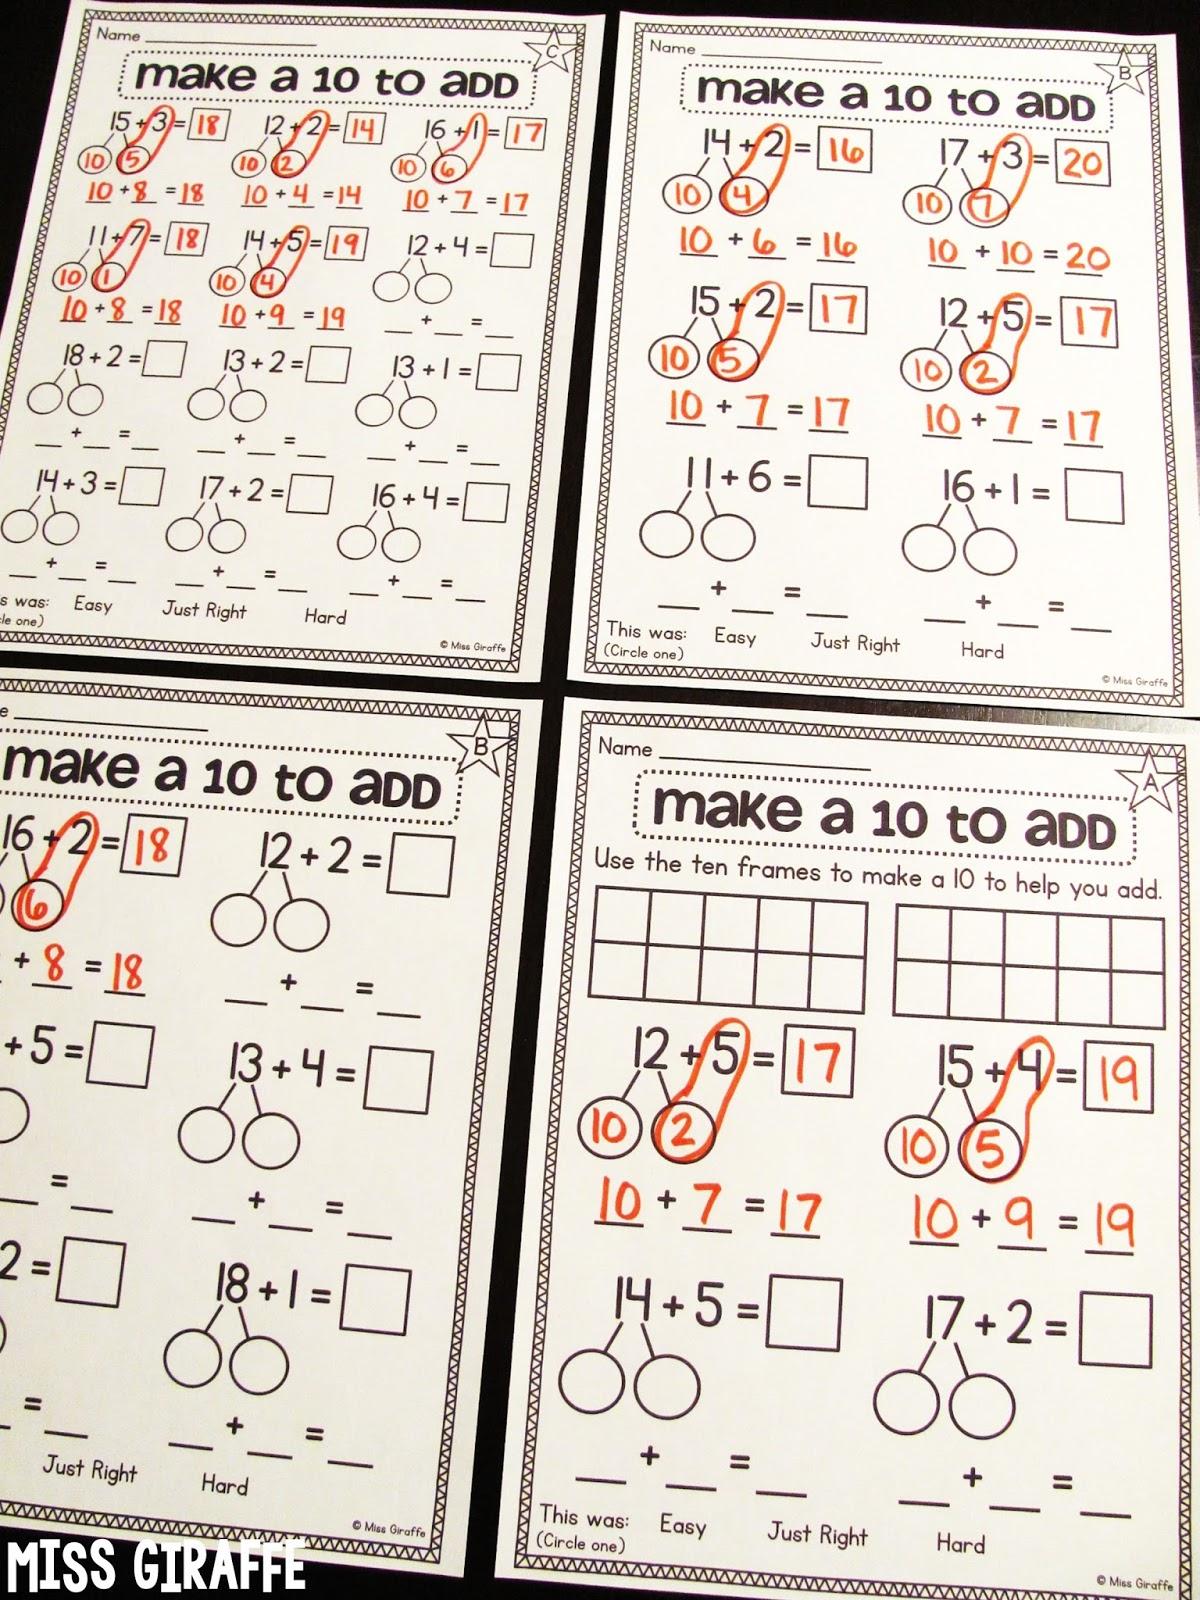 20 Frame Math - Page 4 - Frame Design & Reviews ✓